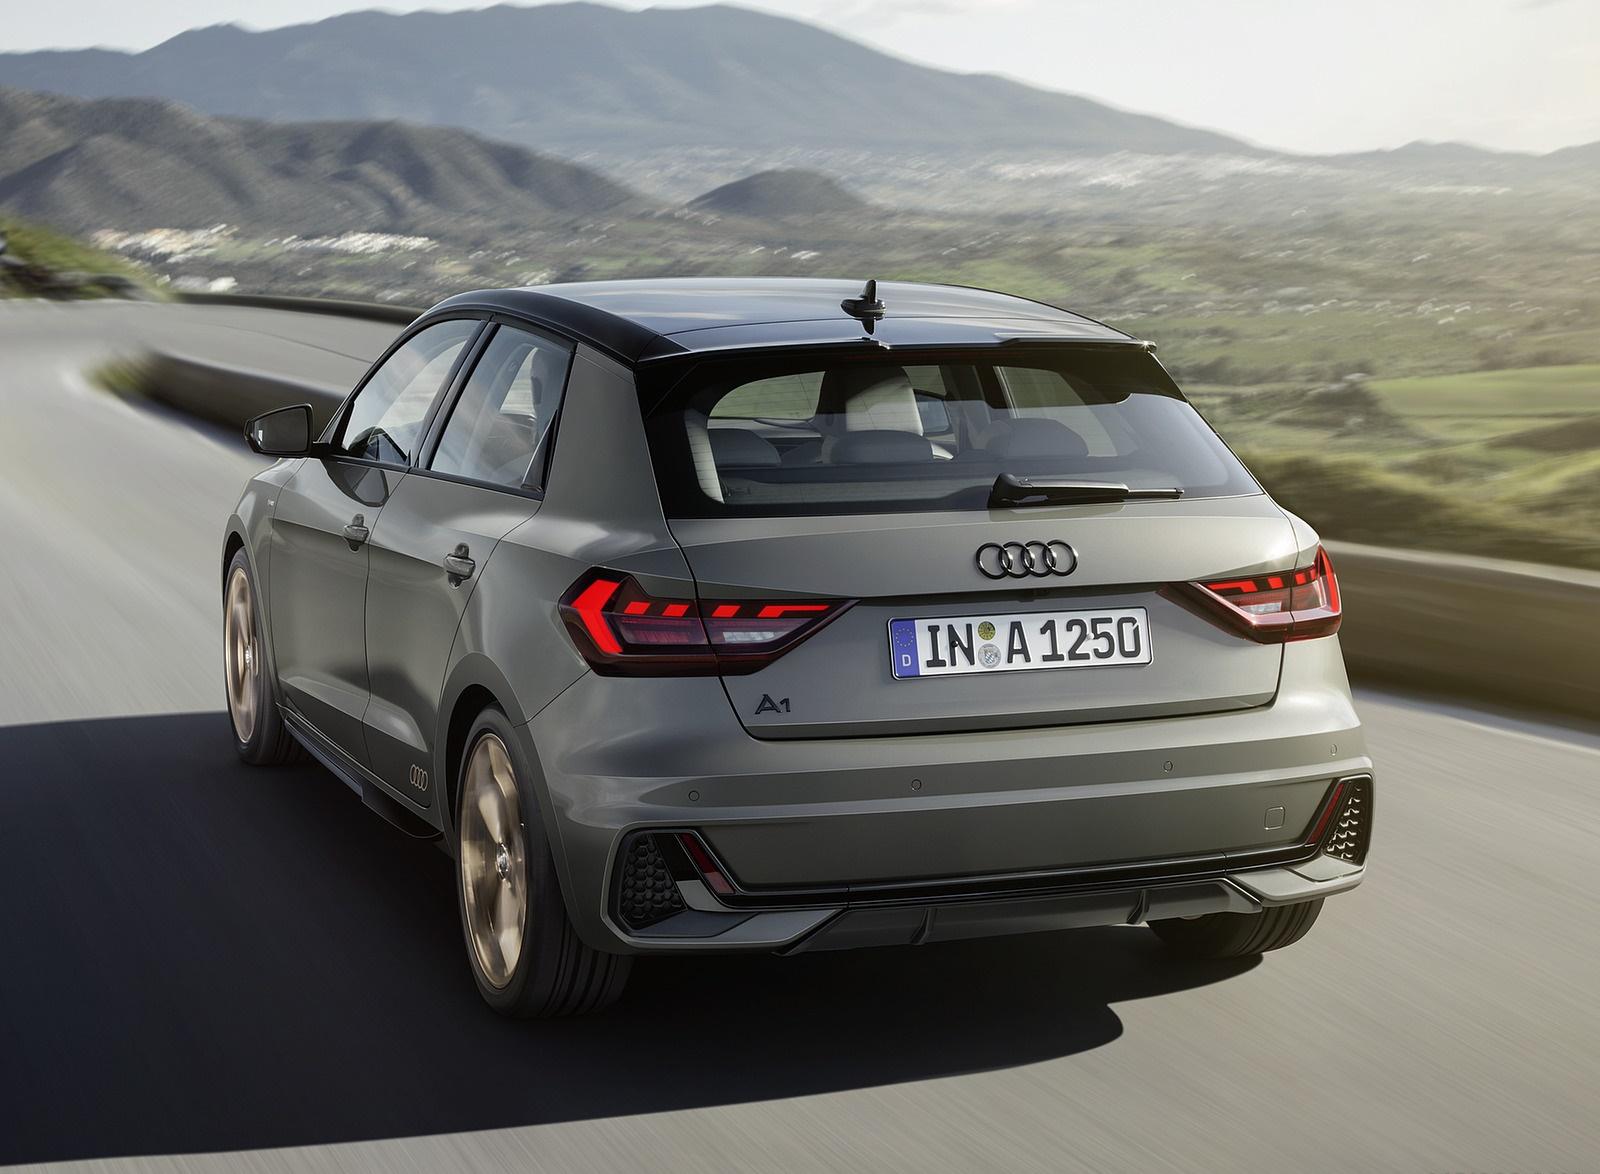 2019 Audi A1 Sportback Color Chronos Grey Rear Wallpapers 8 Newcarcars